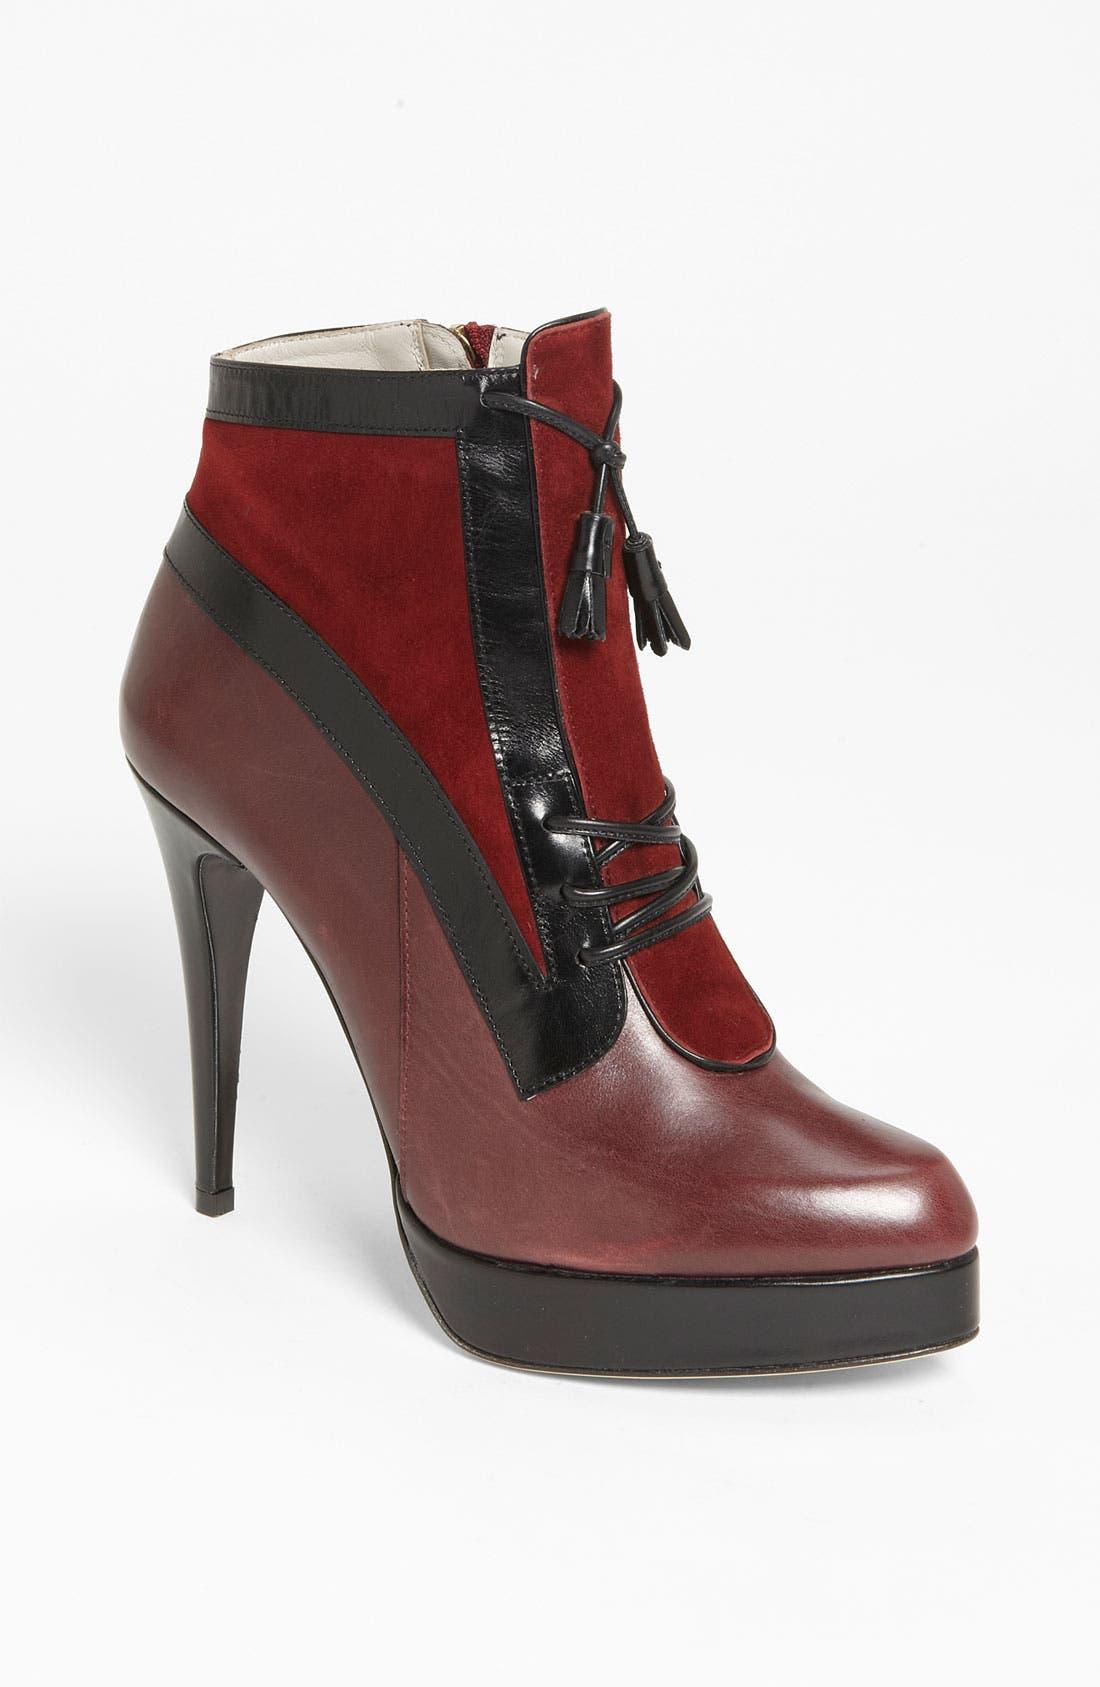 Main Image - Jason Wu Tassel Ankle Boot